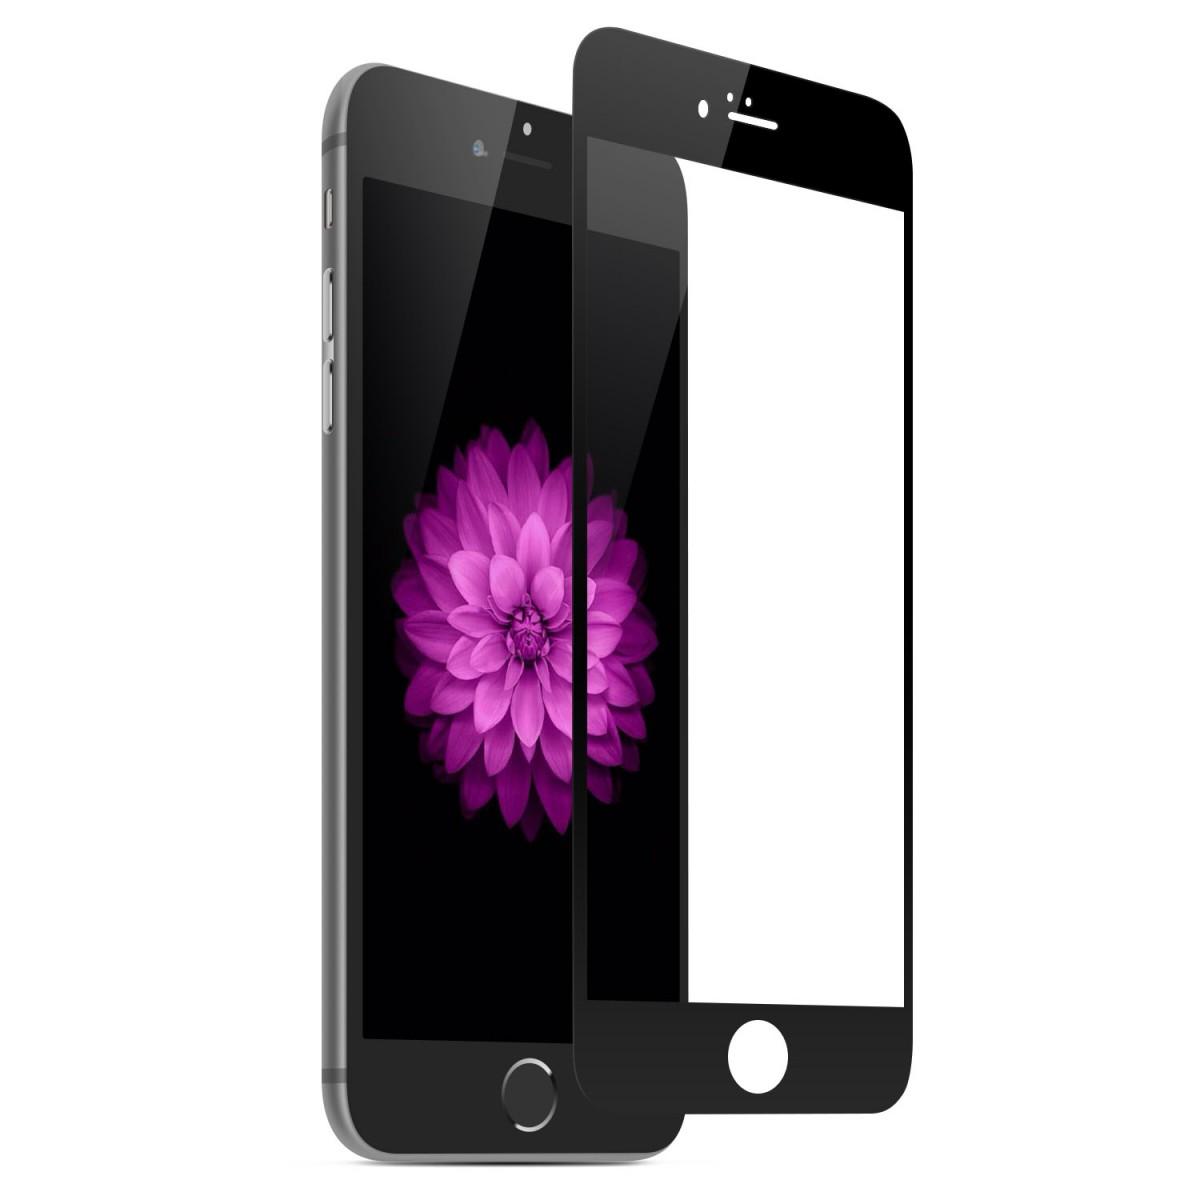 Tvrzené sklo FullCover na iPhone 6s / 6 (černé)